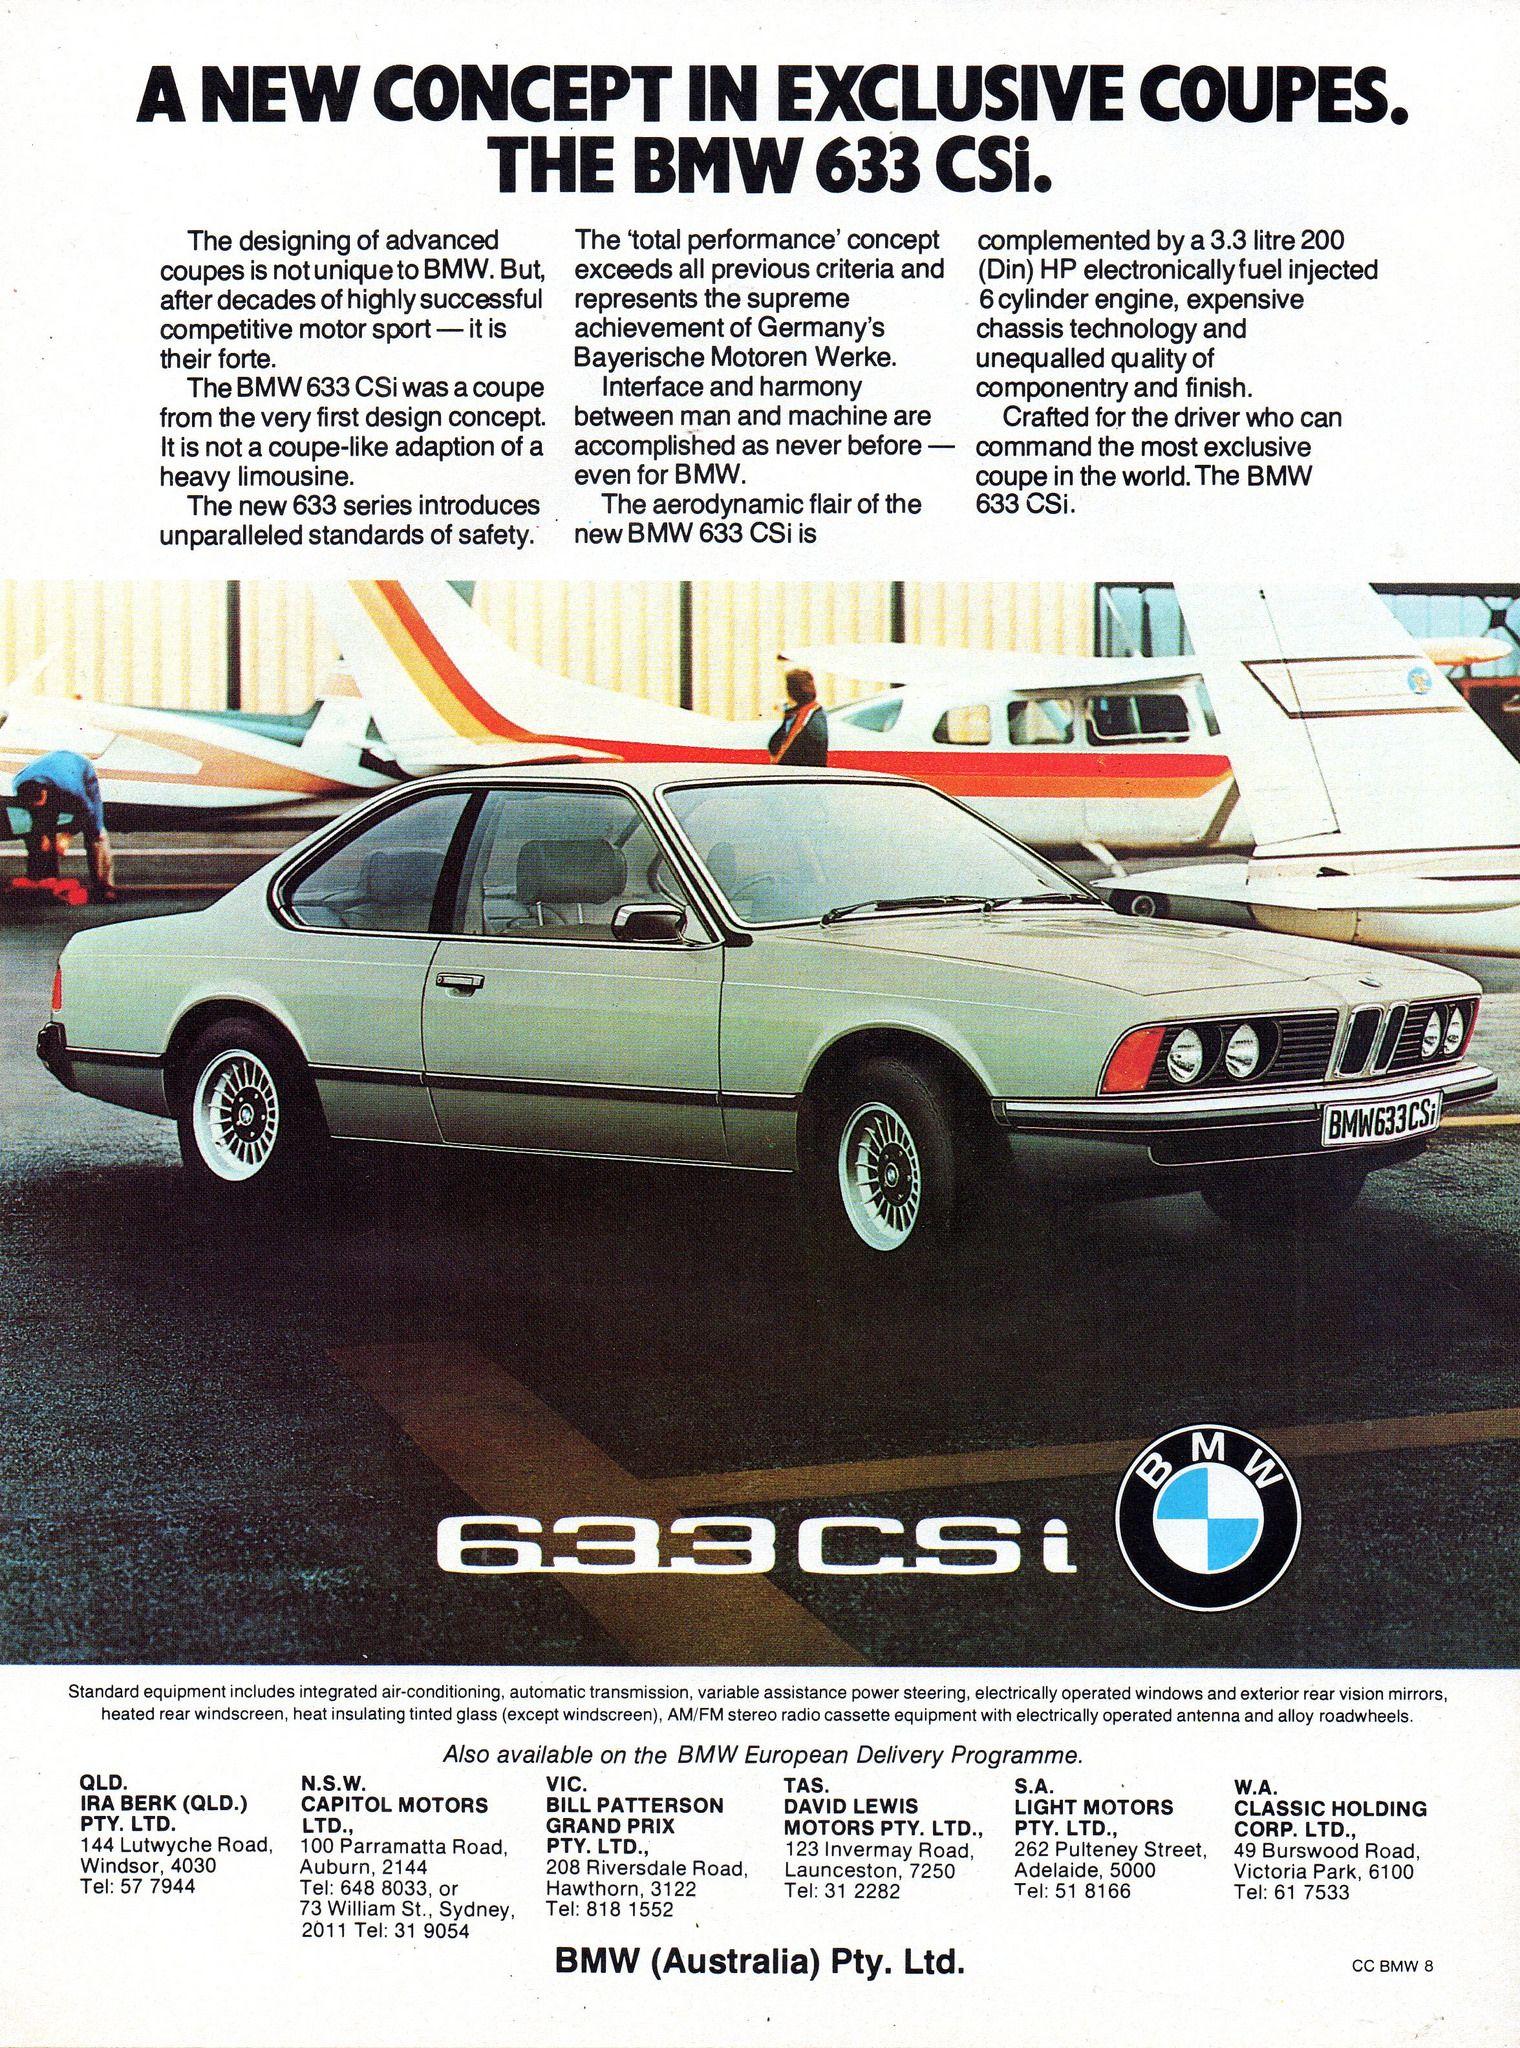 1977 Bmw 633 Csi Coupe Aussie Original Magazine Advertisement Bmw Bmw E24 Bmw Alpina